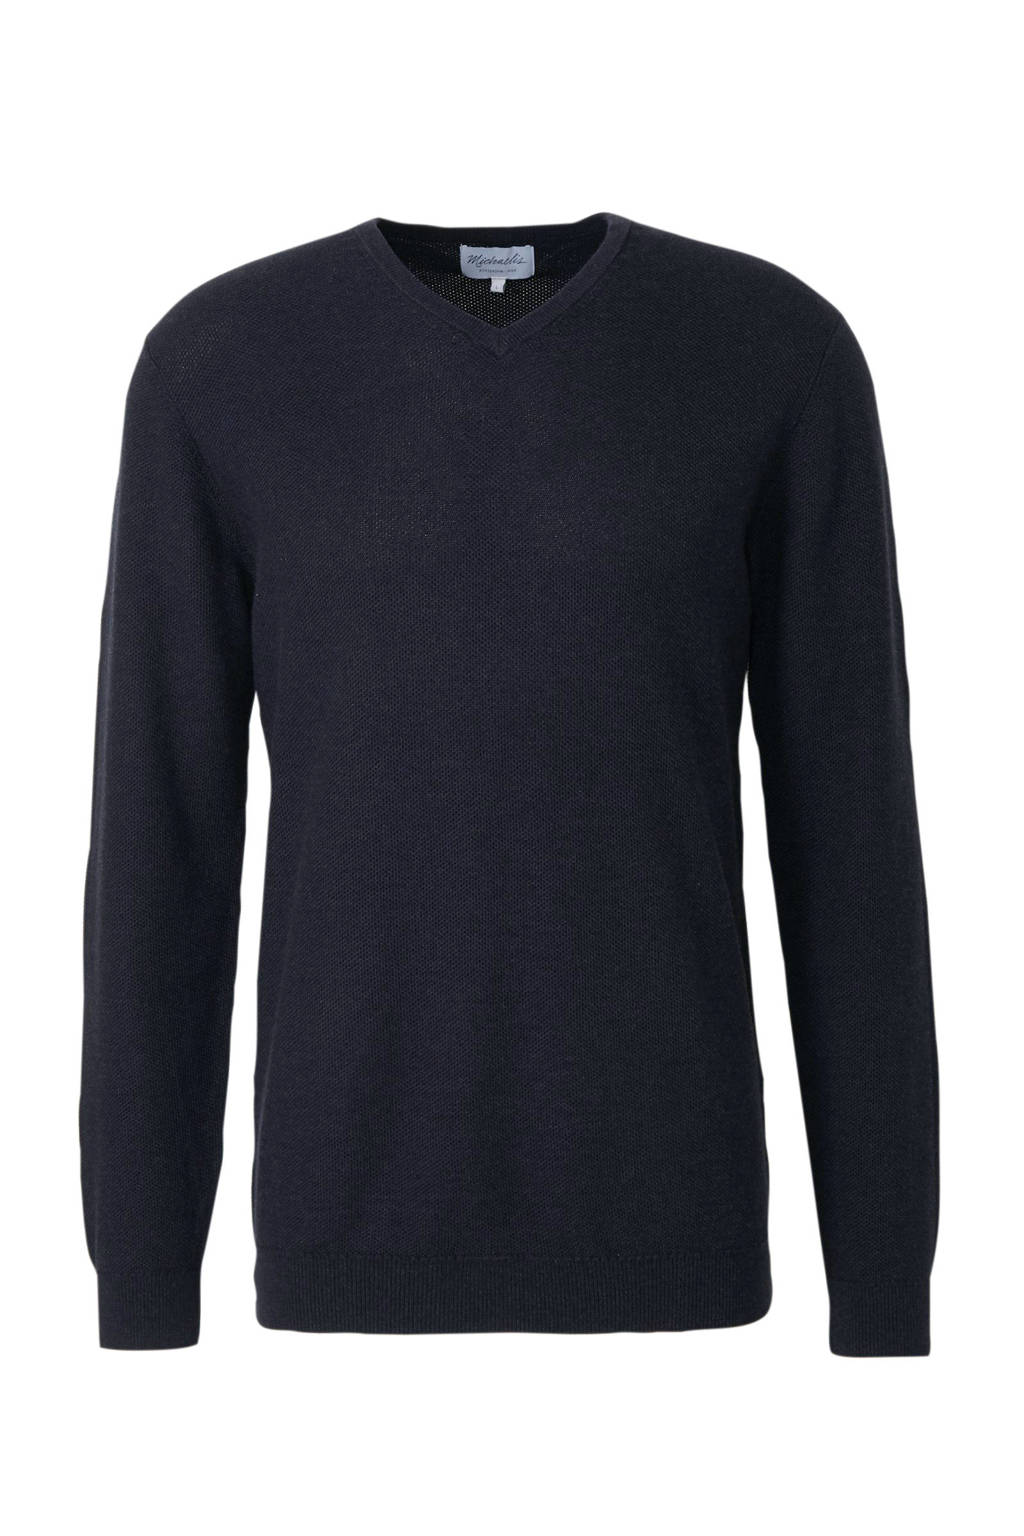 Michaelis fijngebreide trui donkerblauw, Donkerblauw